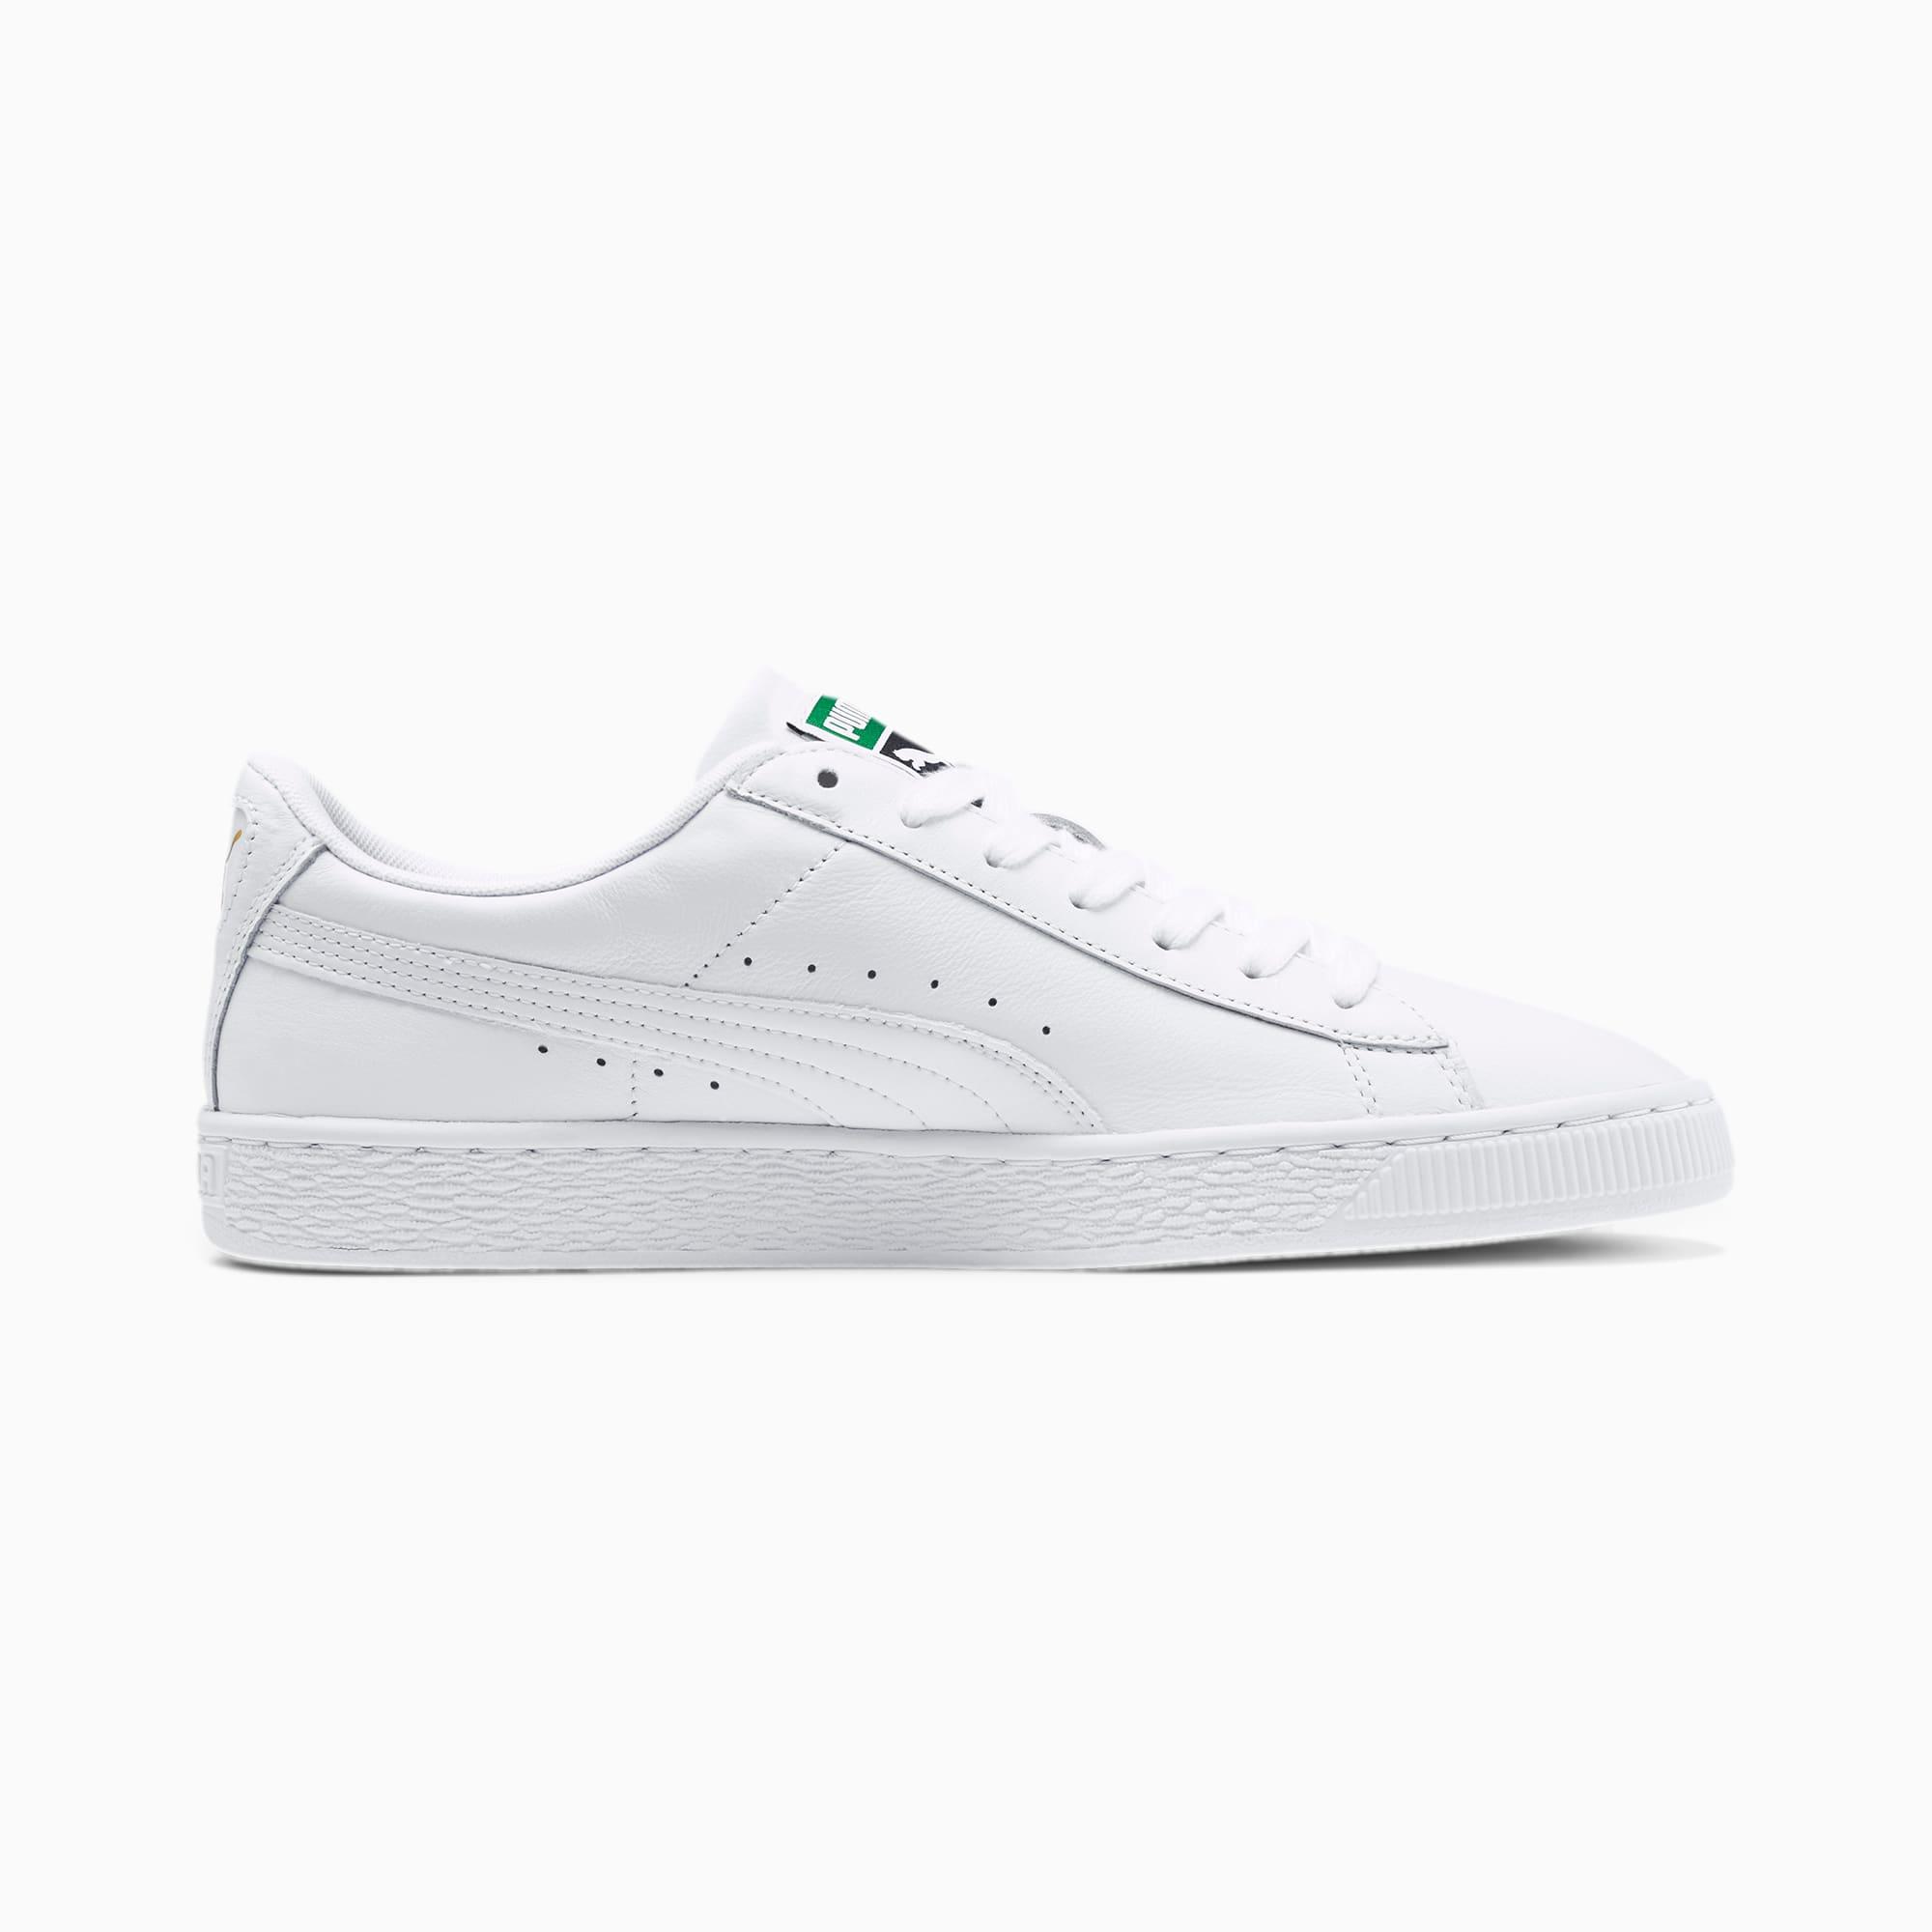 Puma Basket Classic Lfs Shoe White White | SurfStitch